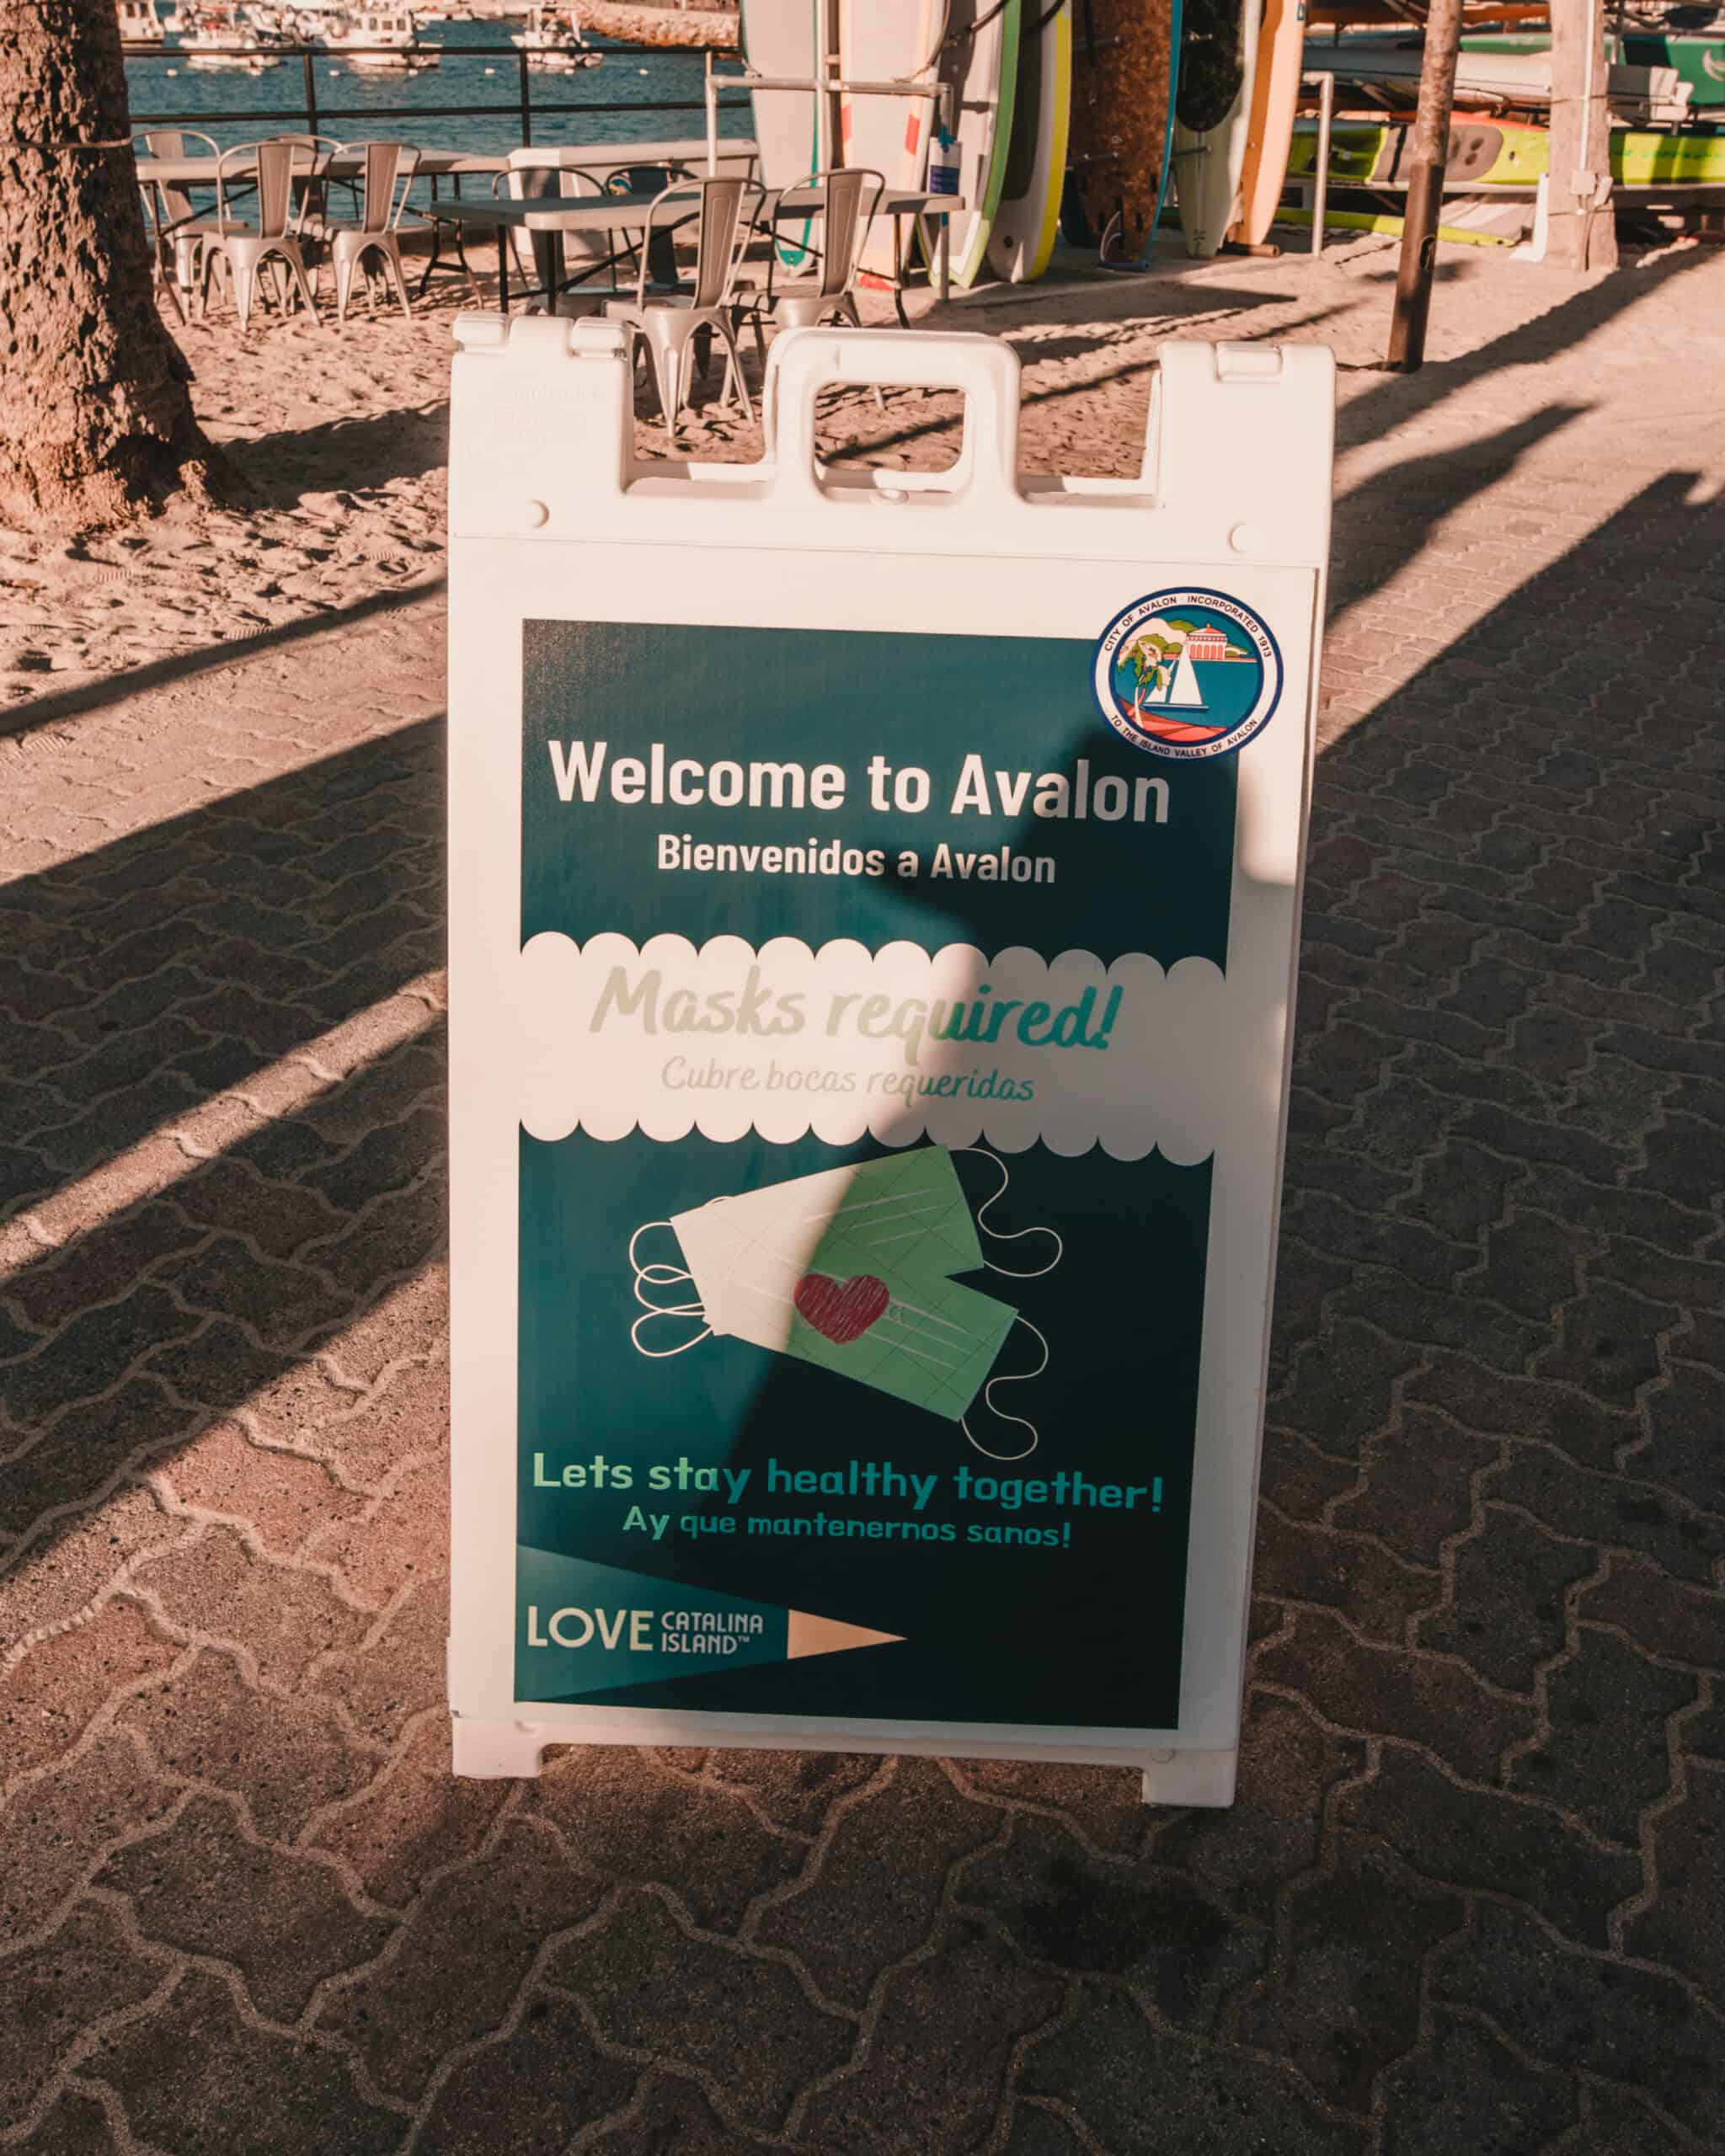 Avalon Safety Precautions